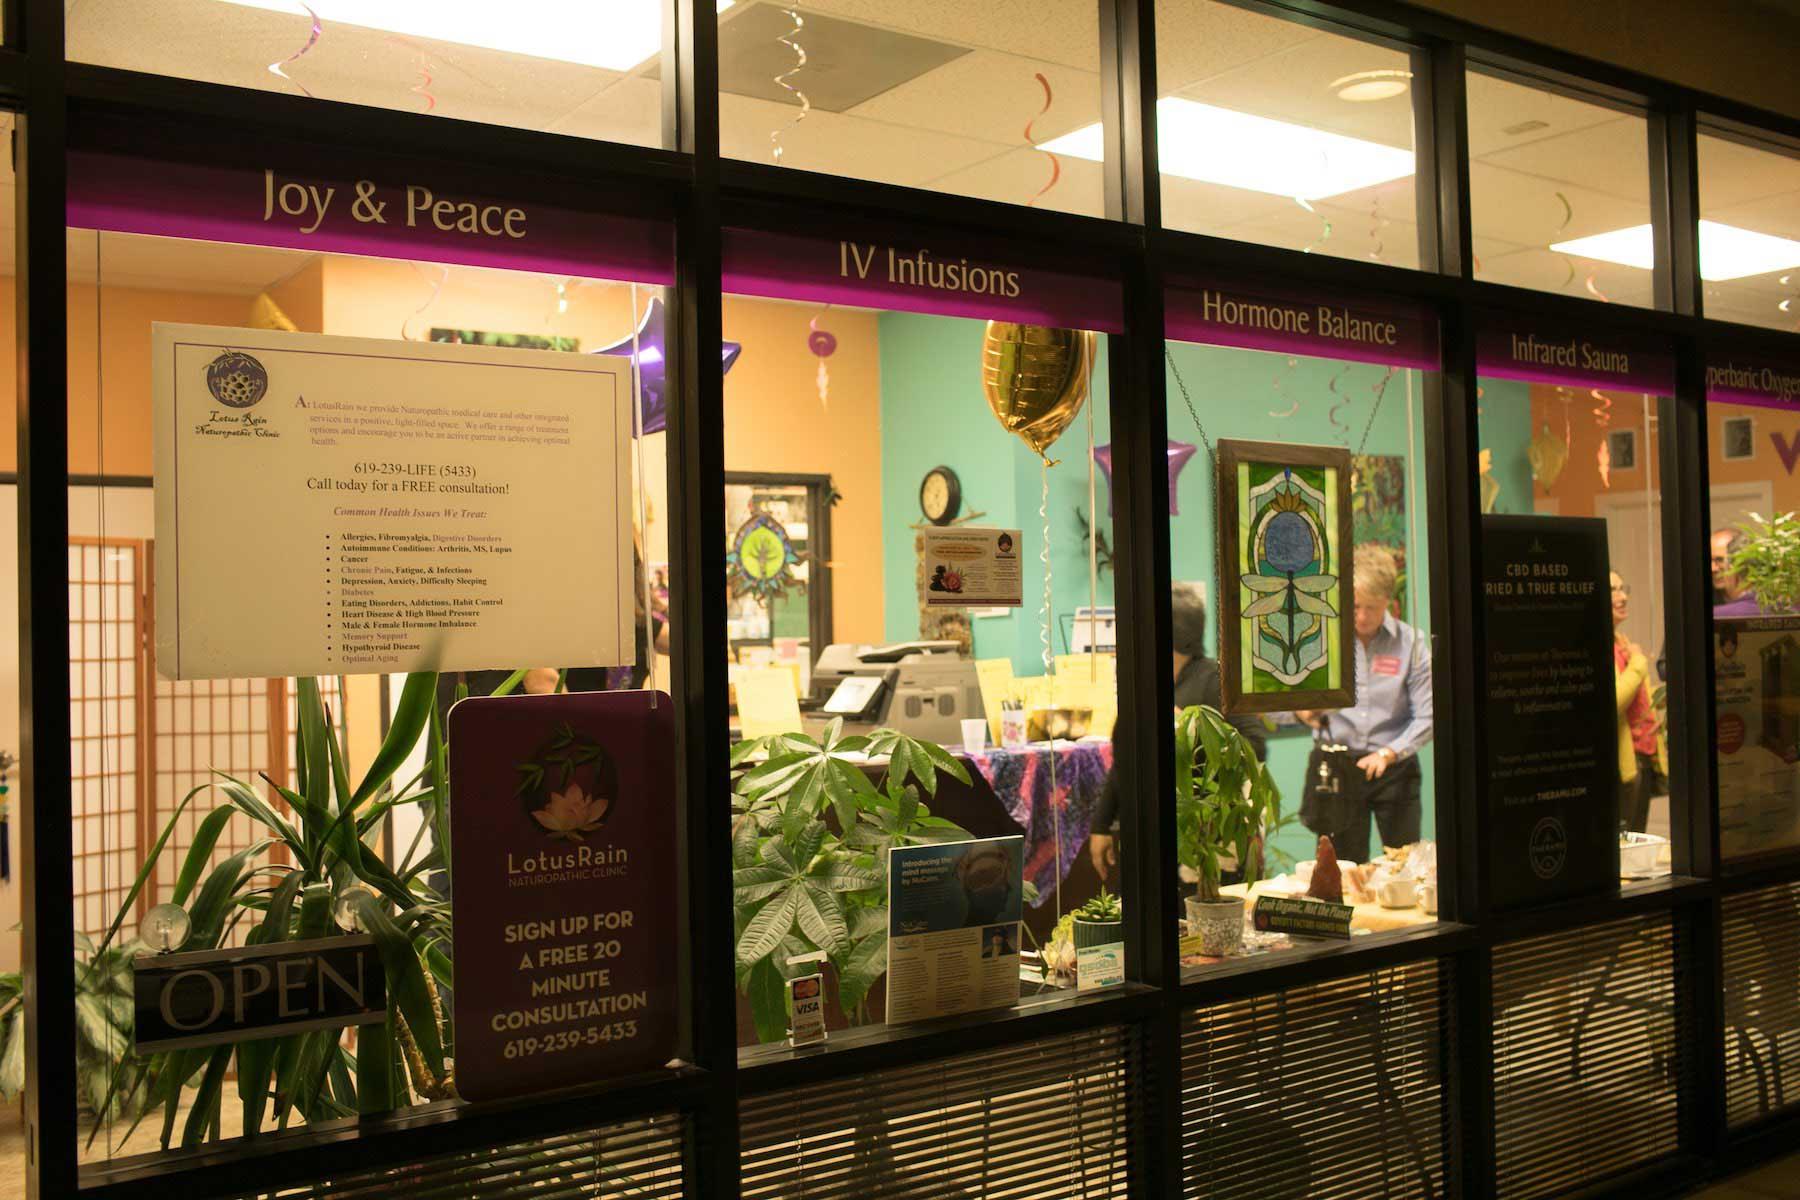 Lotus rain clinic view